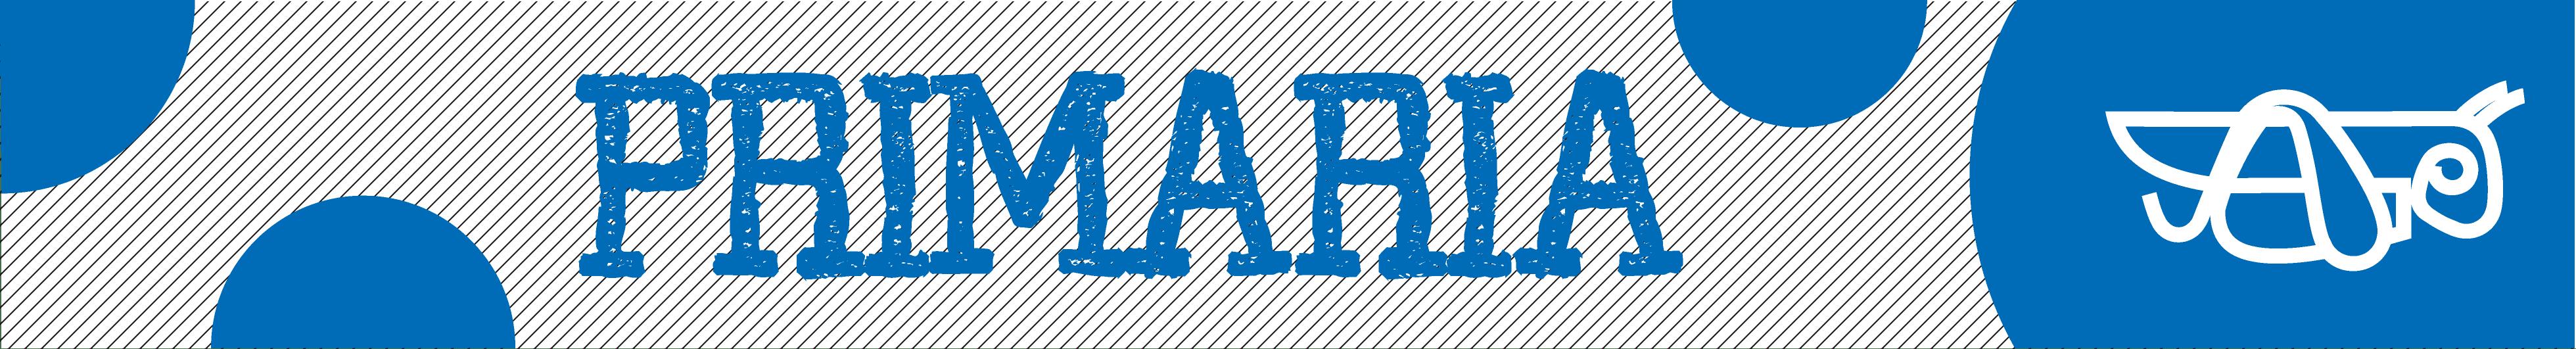 Banner P